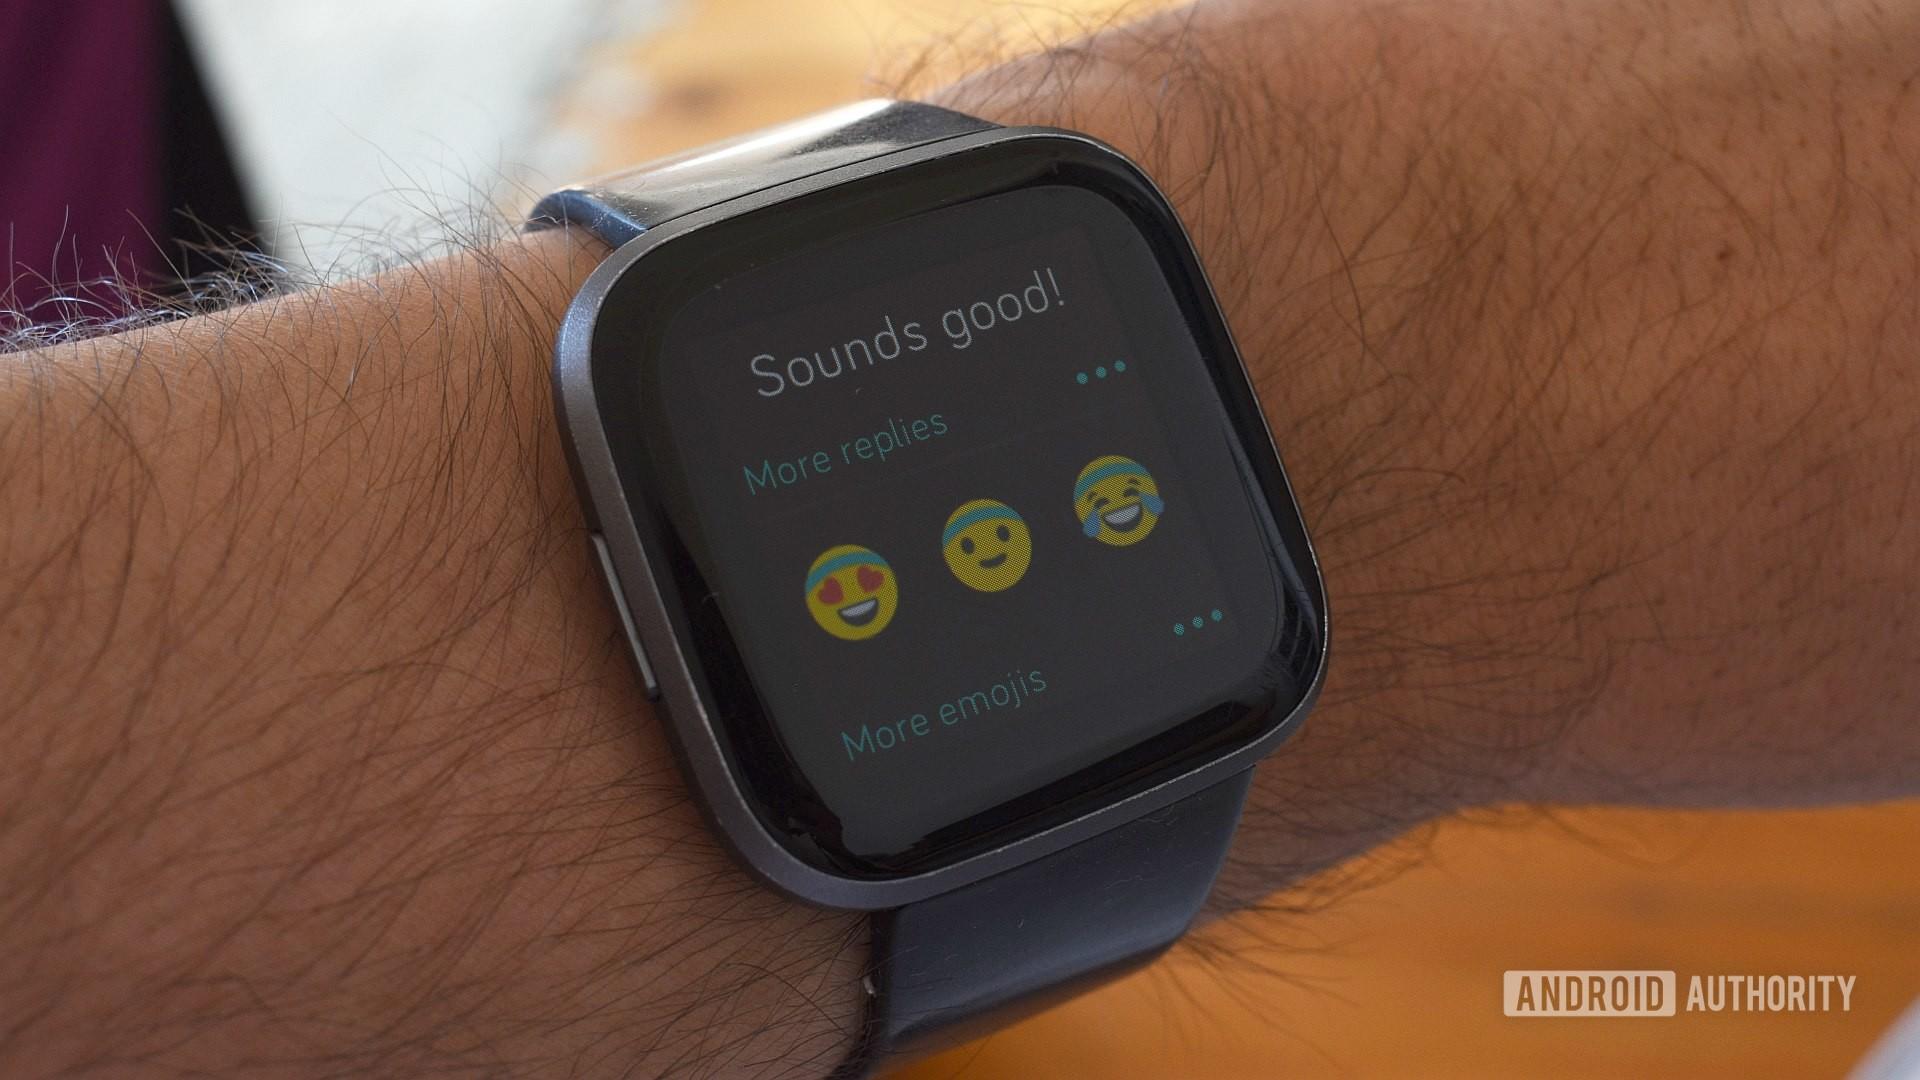 fitbit messaging emoji replies